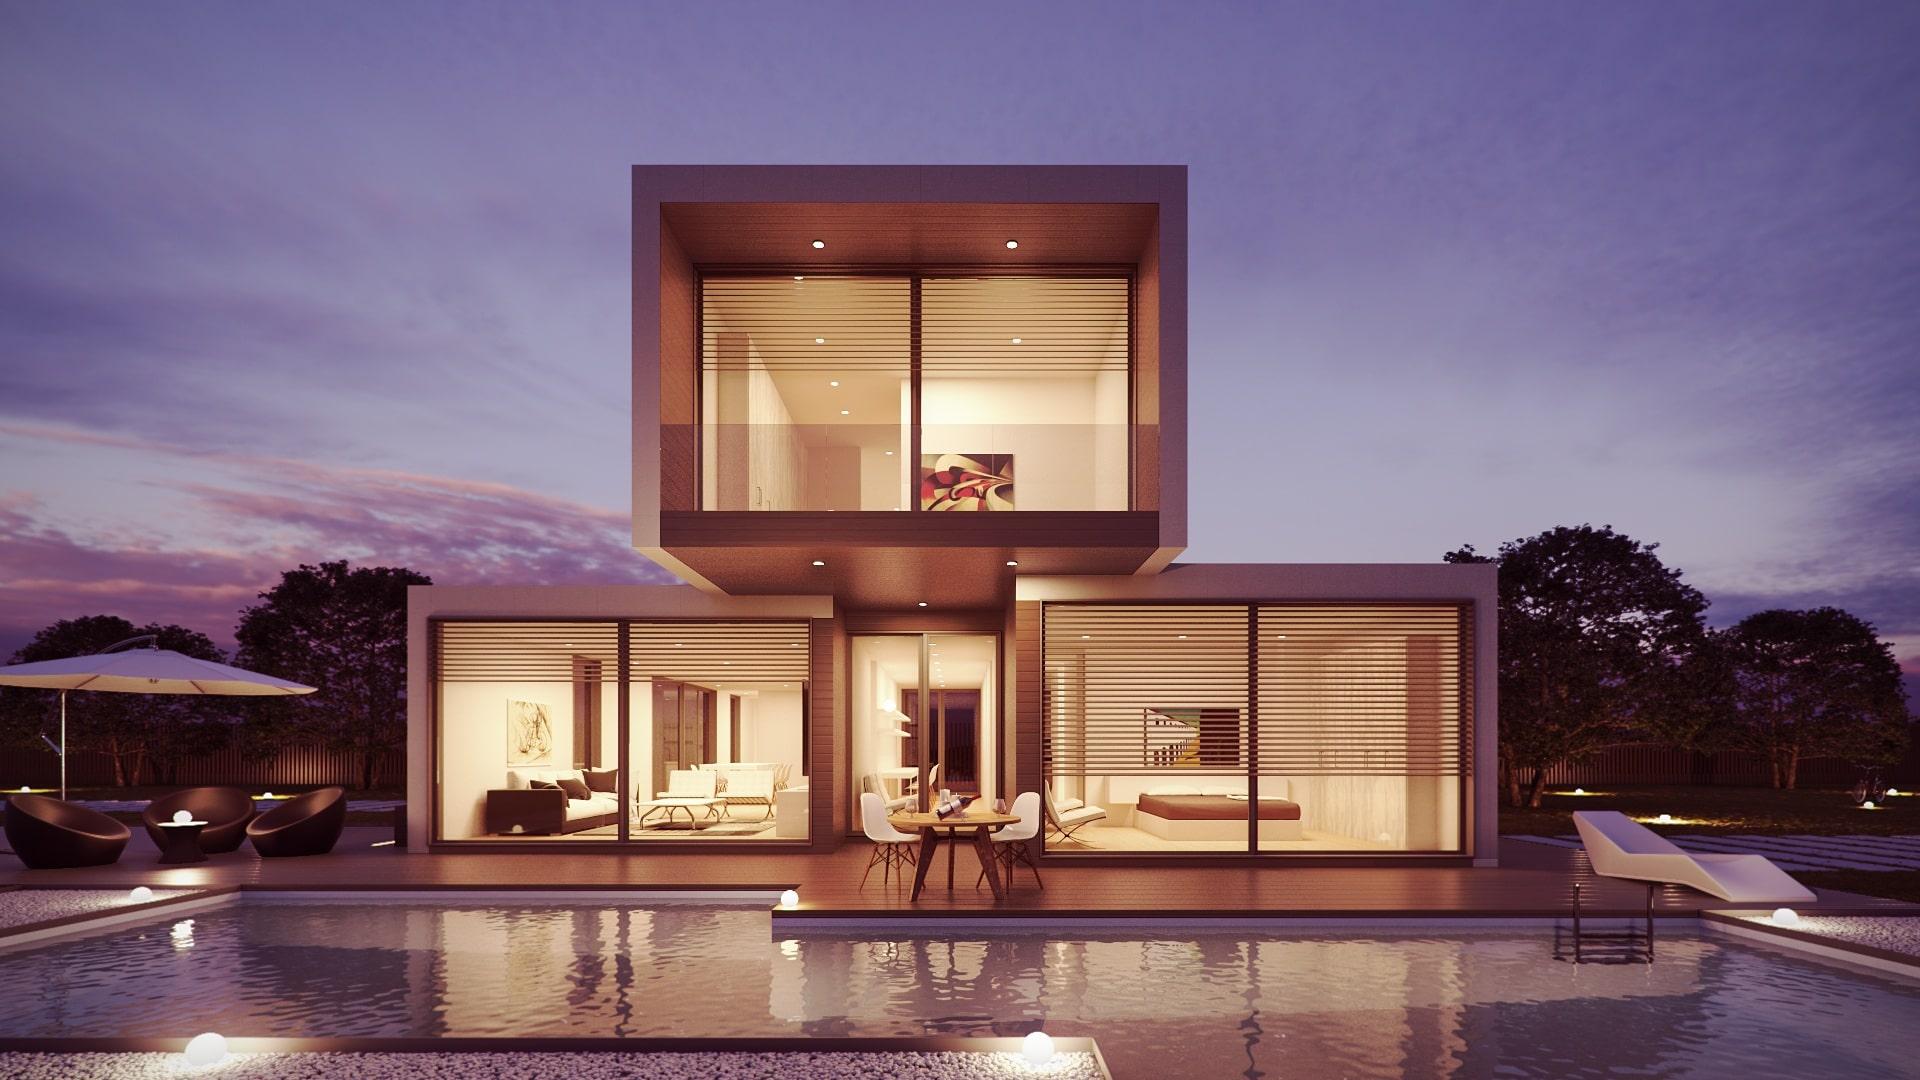 Design terrestre - habitation